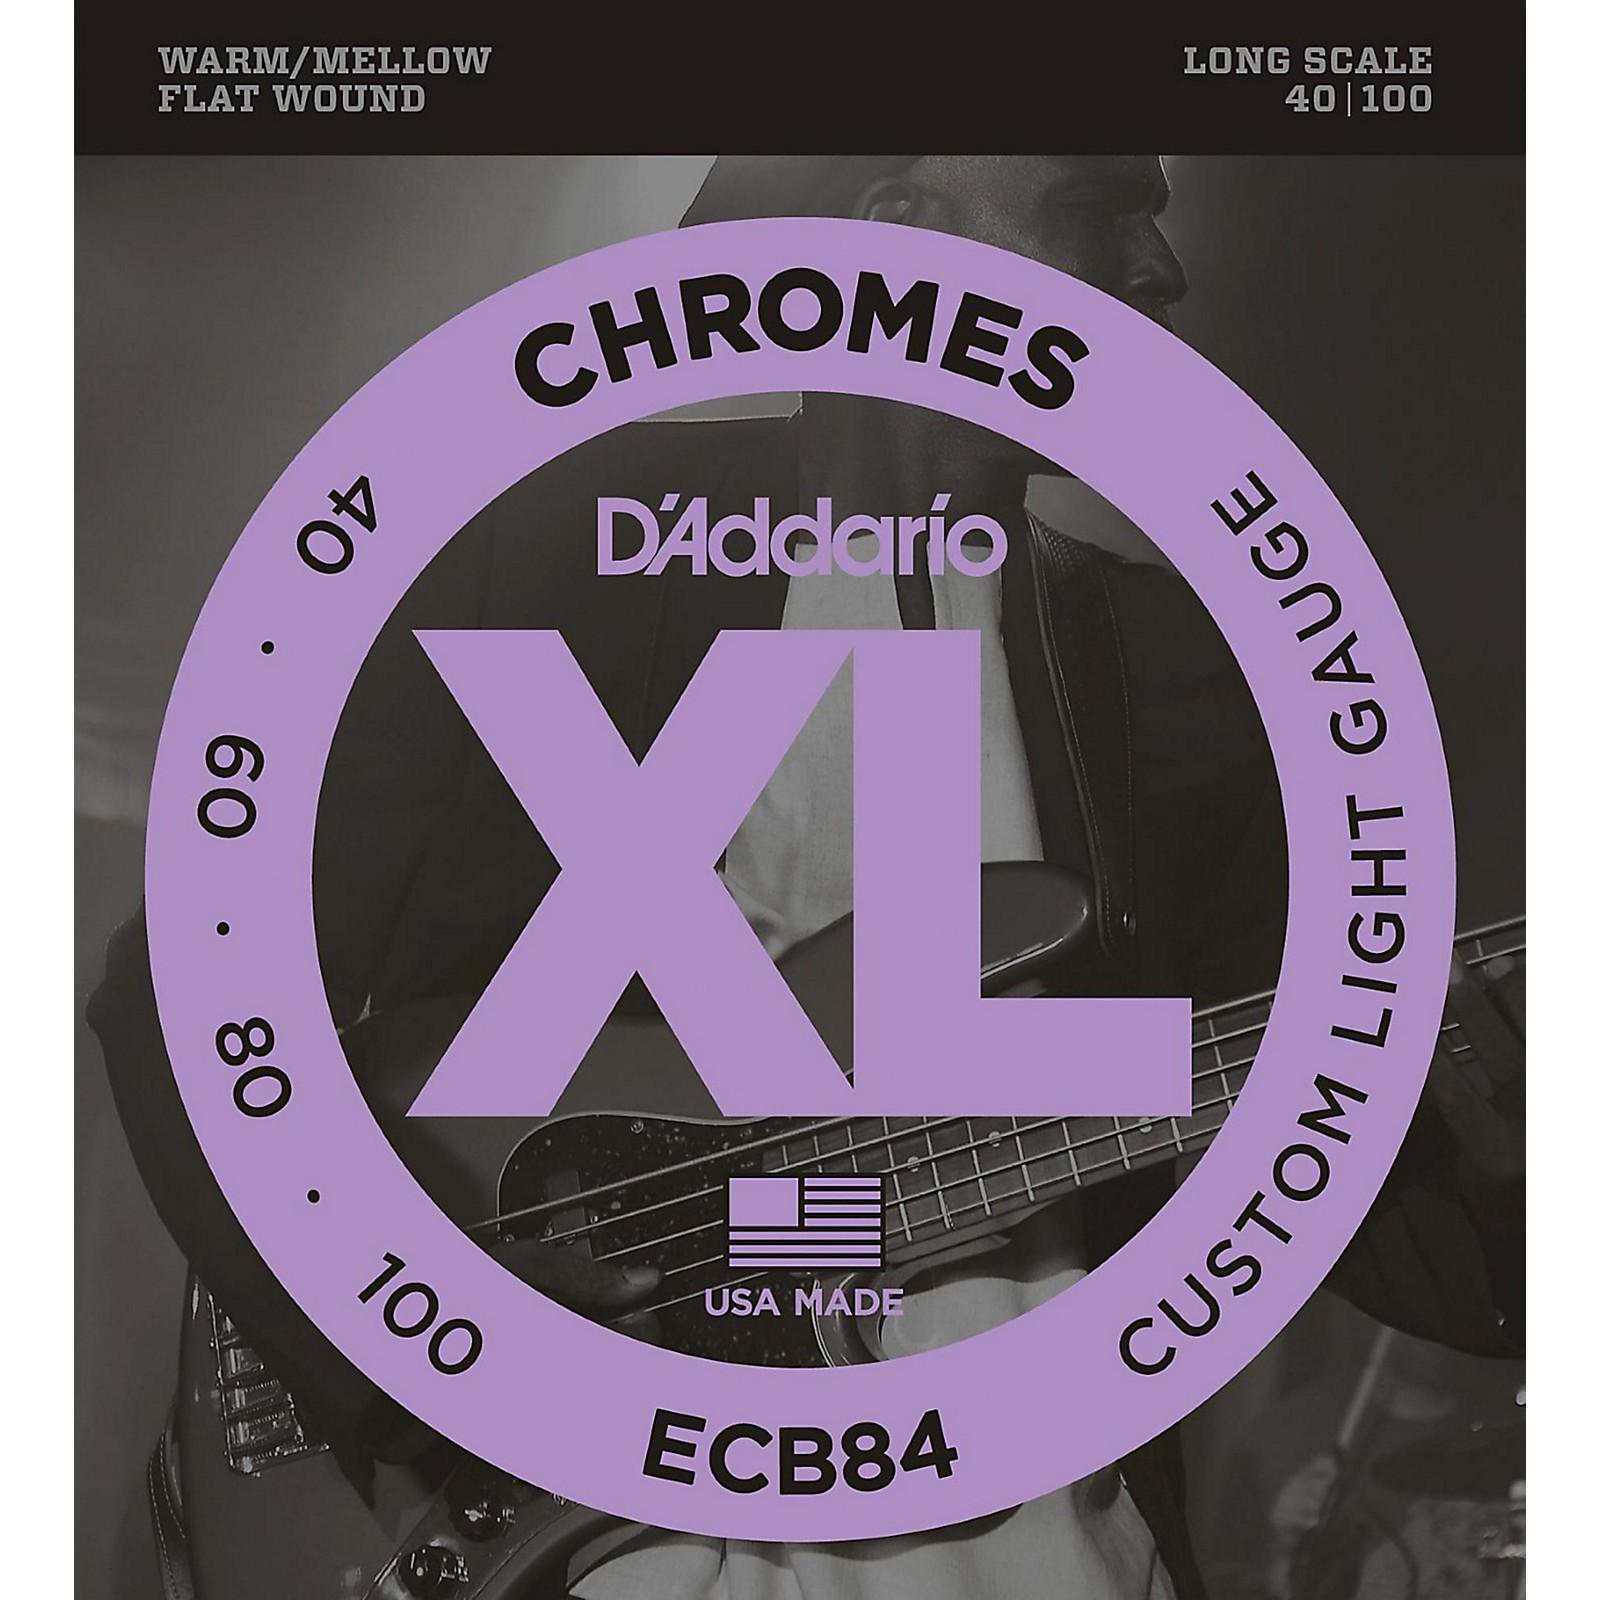 D'Addario ECB84 Chromes Flat Wound Custom Light Long Scale Electric Bass Strings